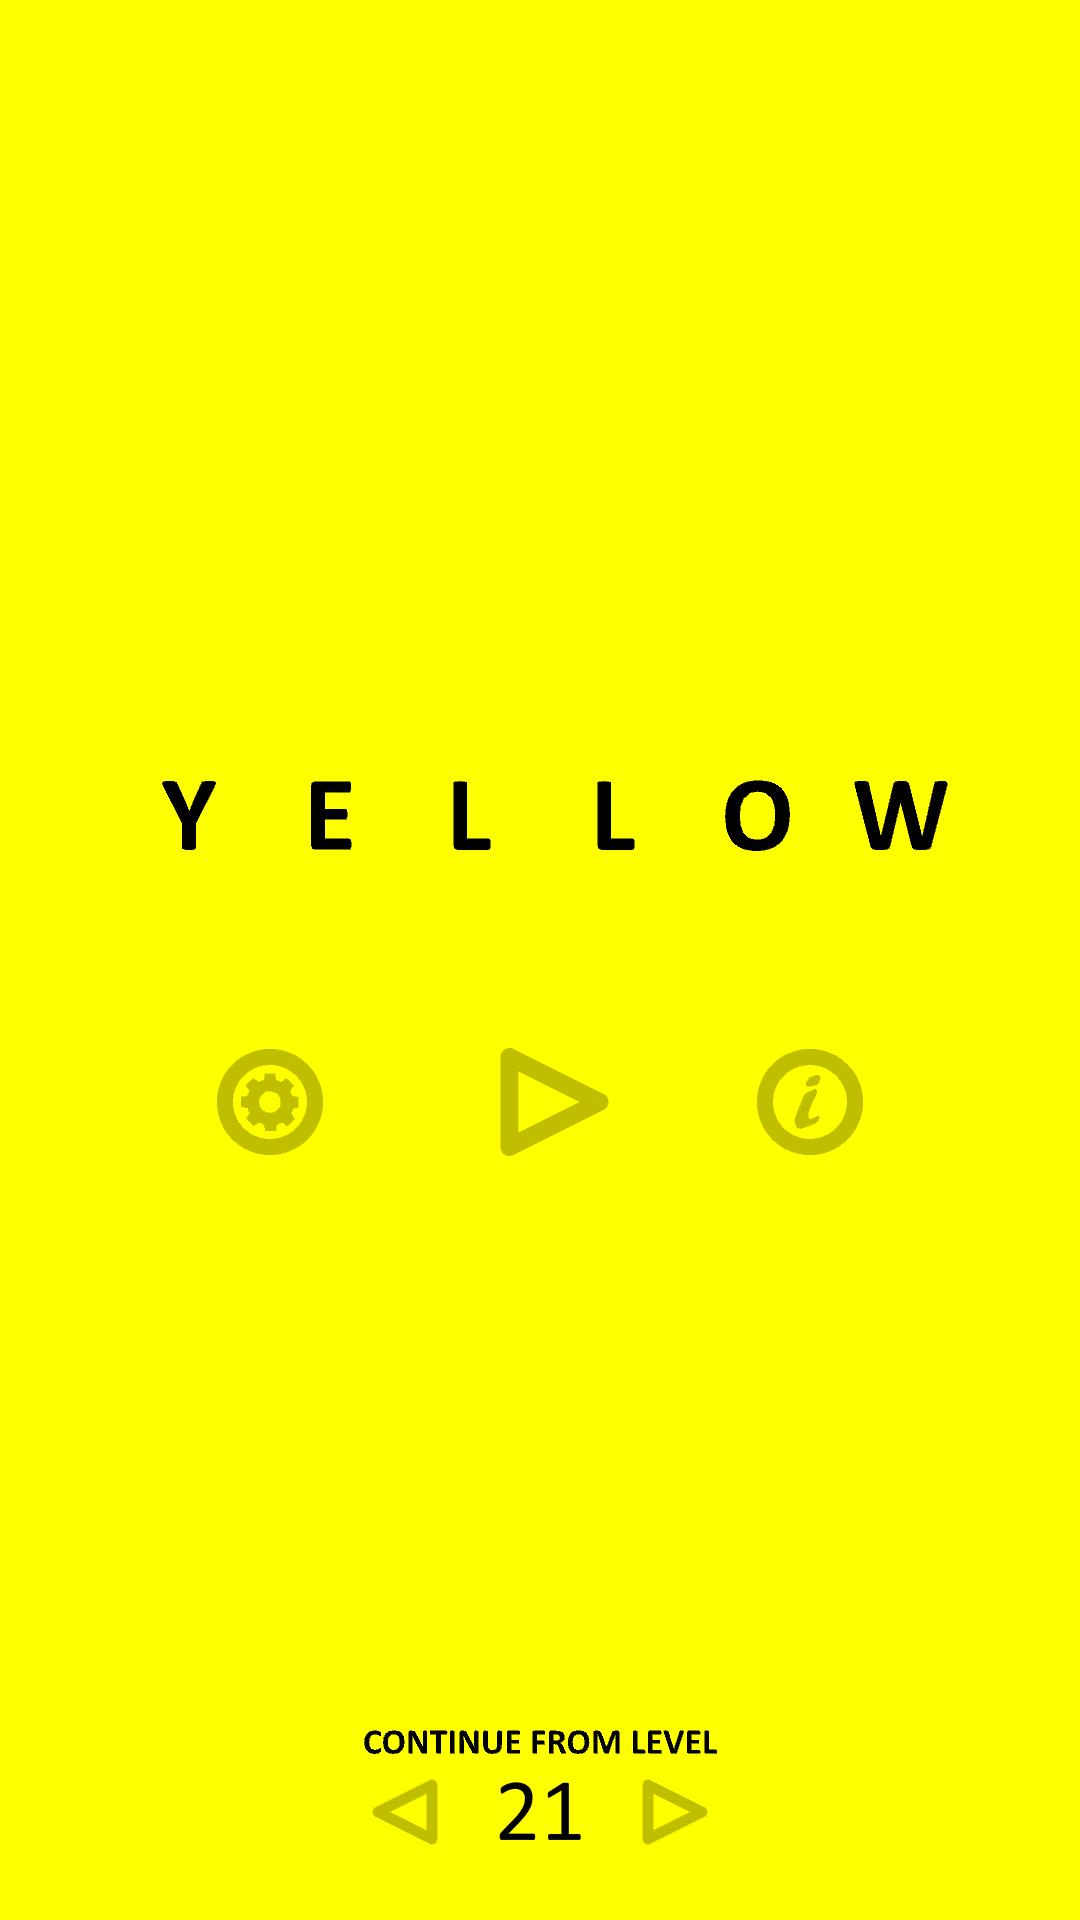 《Yellow》游戏全50关通关图文攻略